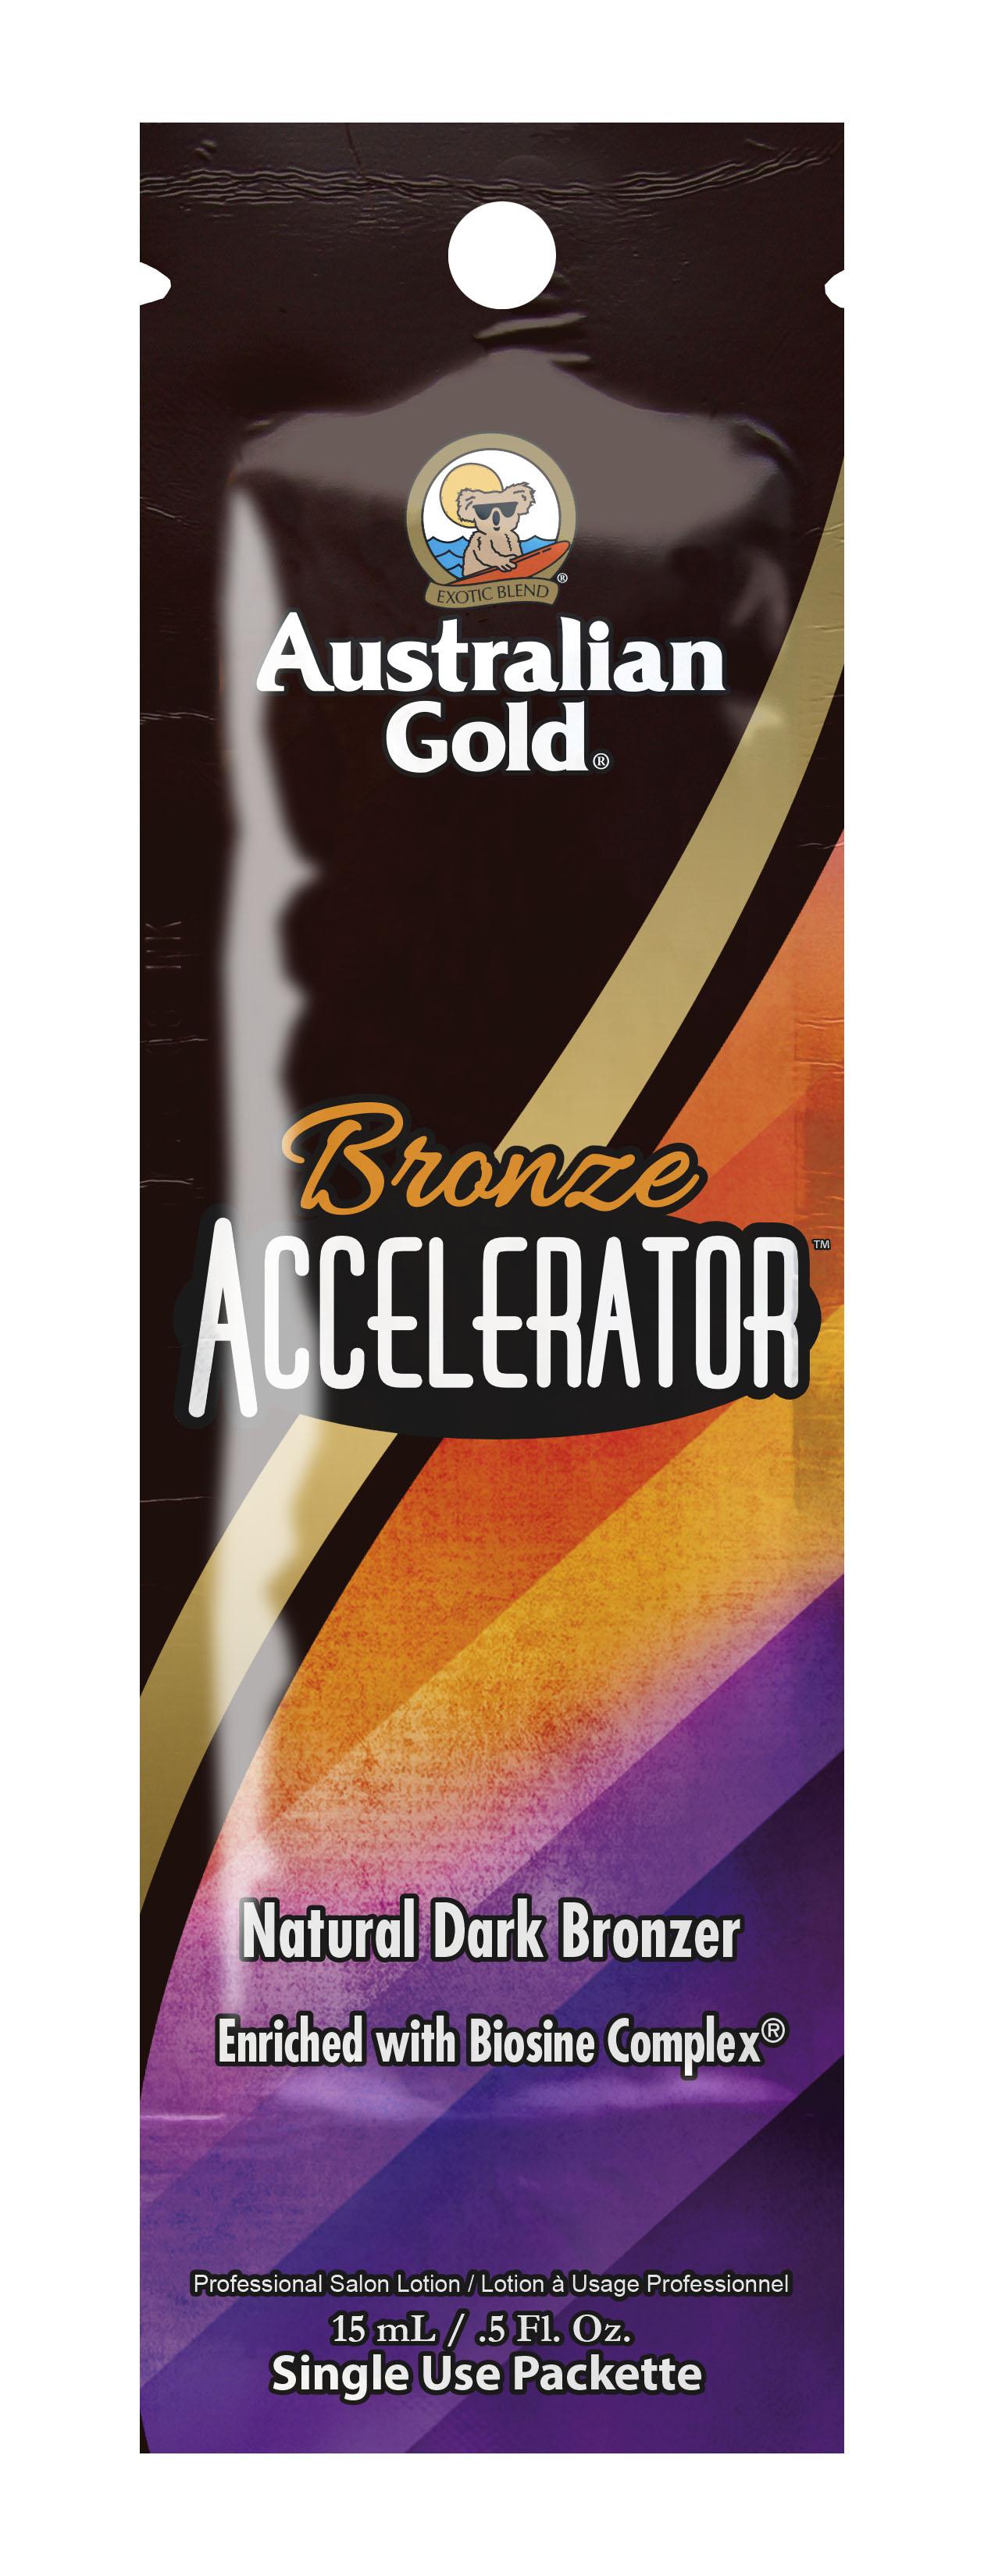 Bronze Accelerator™ Instant Bronzer with Biosine Complex®